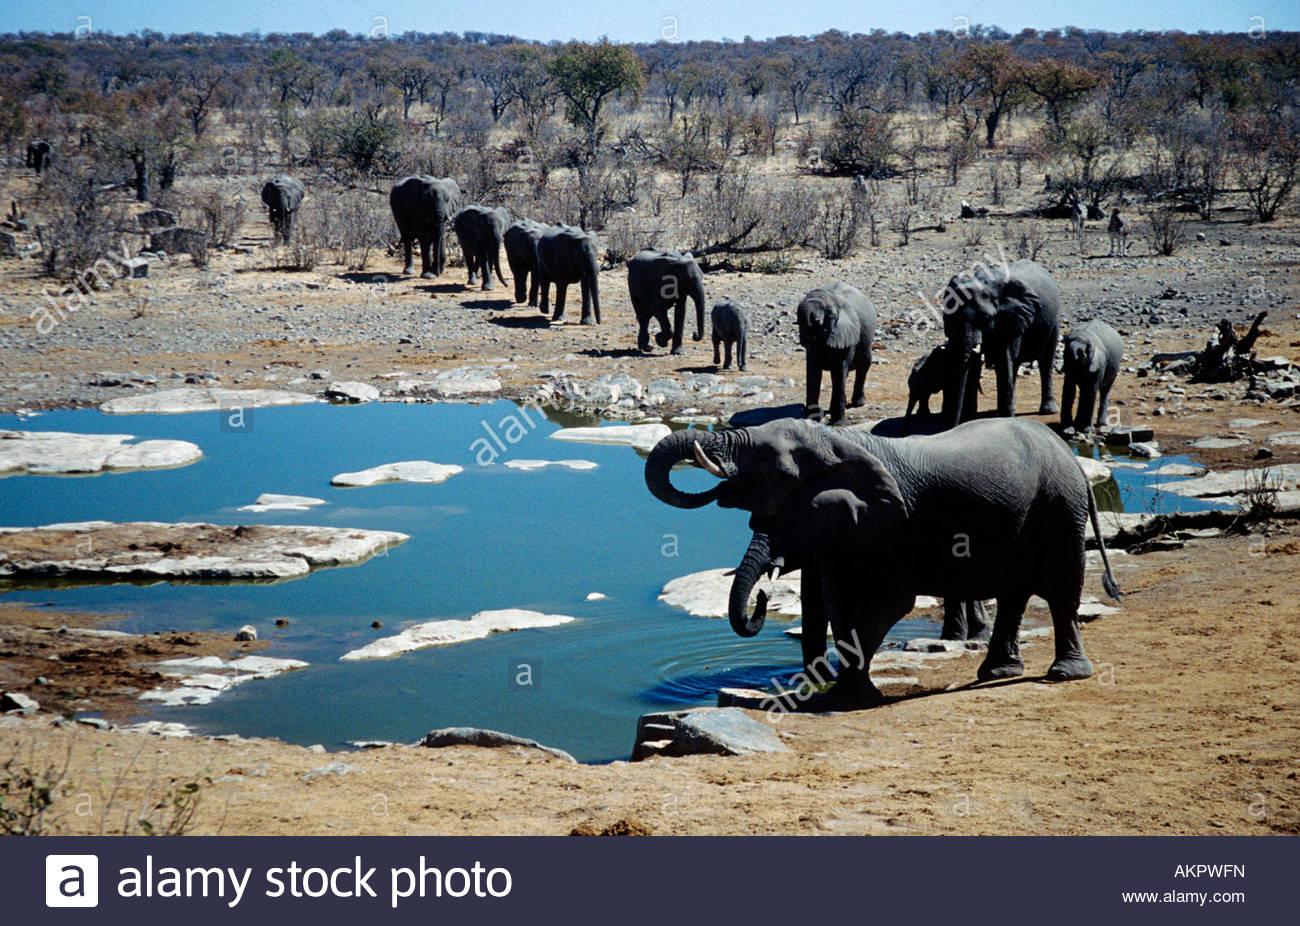 Elephants at water hole - Stock Image